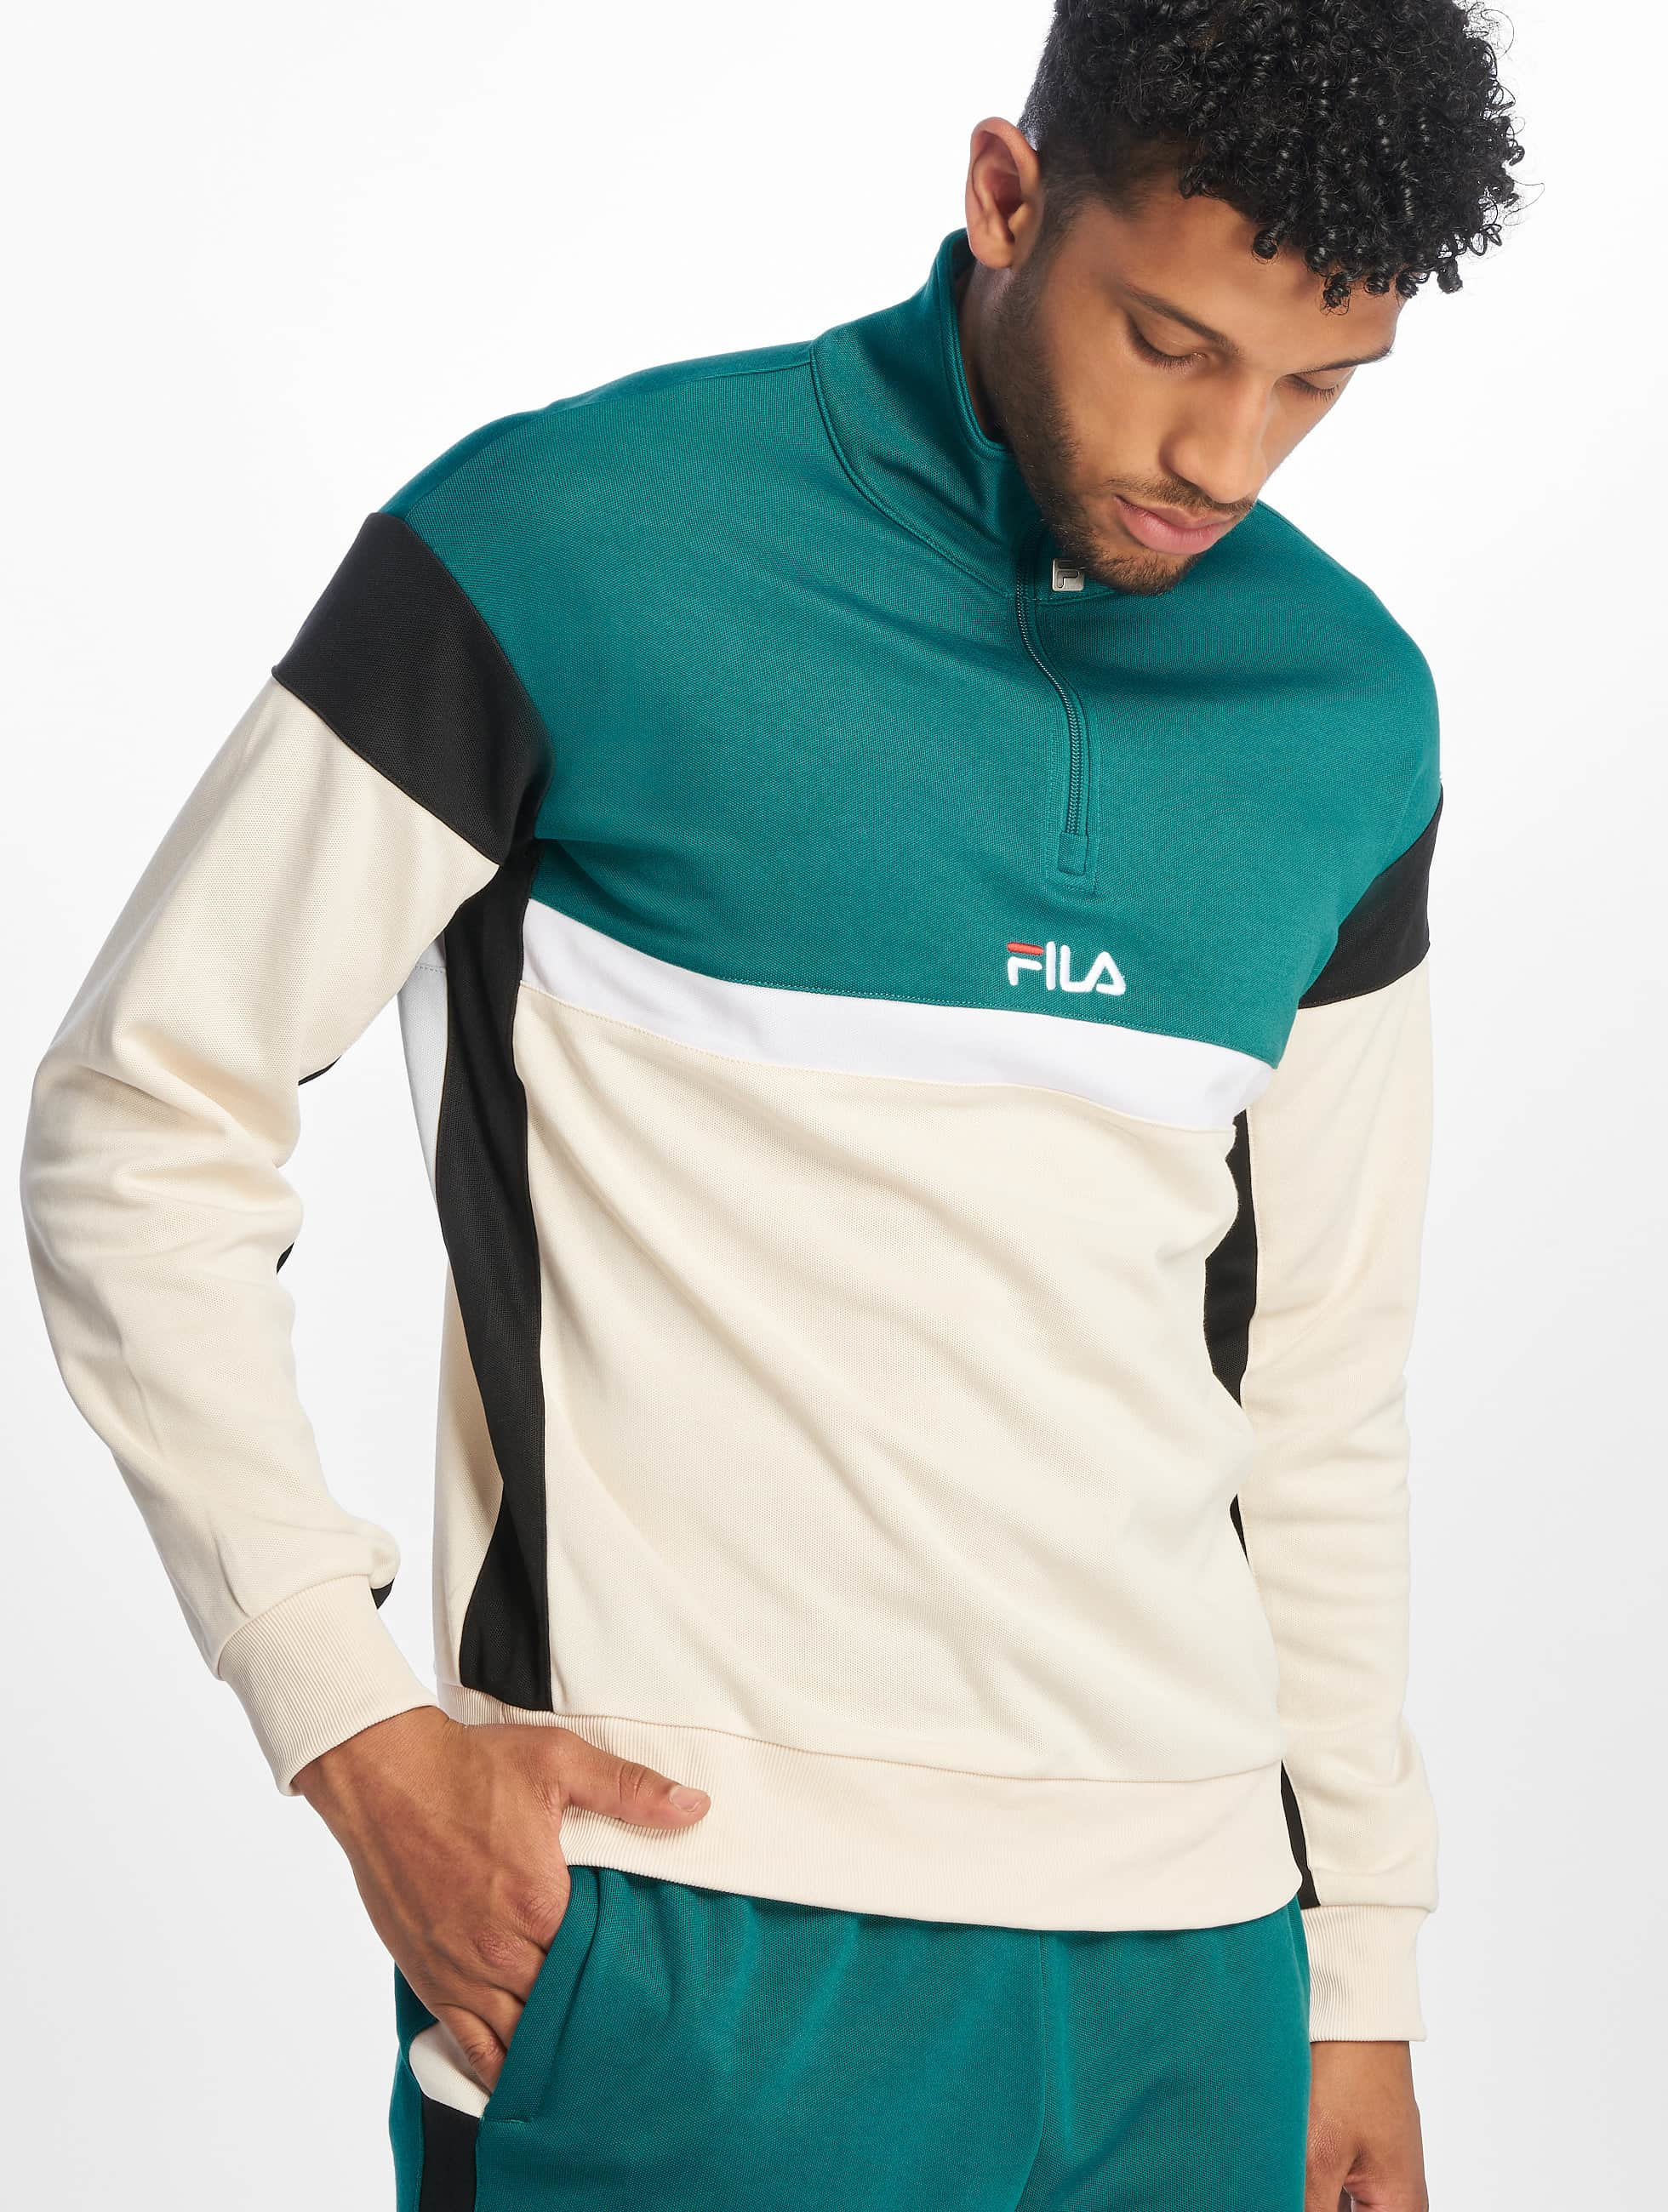 Fila Urban Line Herron Half Zip Sweatshirt Shaded SpruceBlackWhitecap Grey